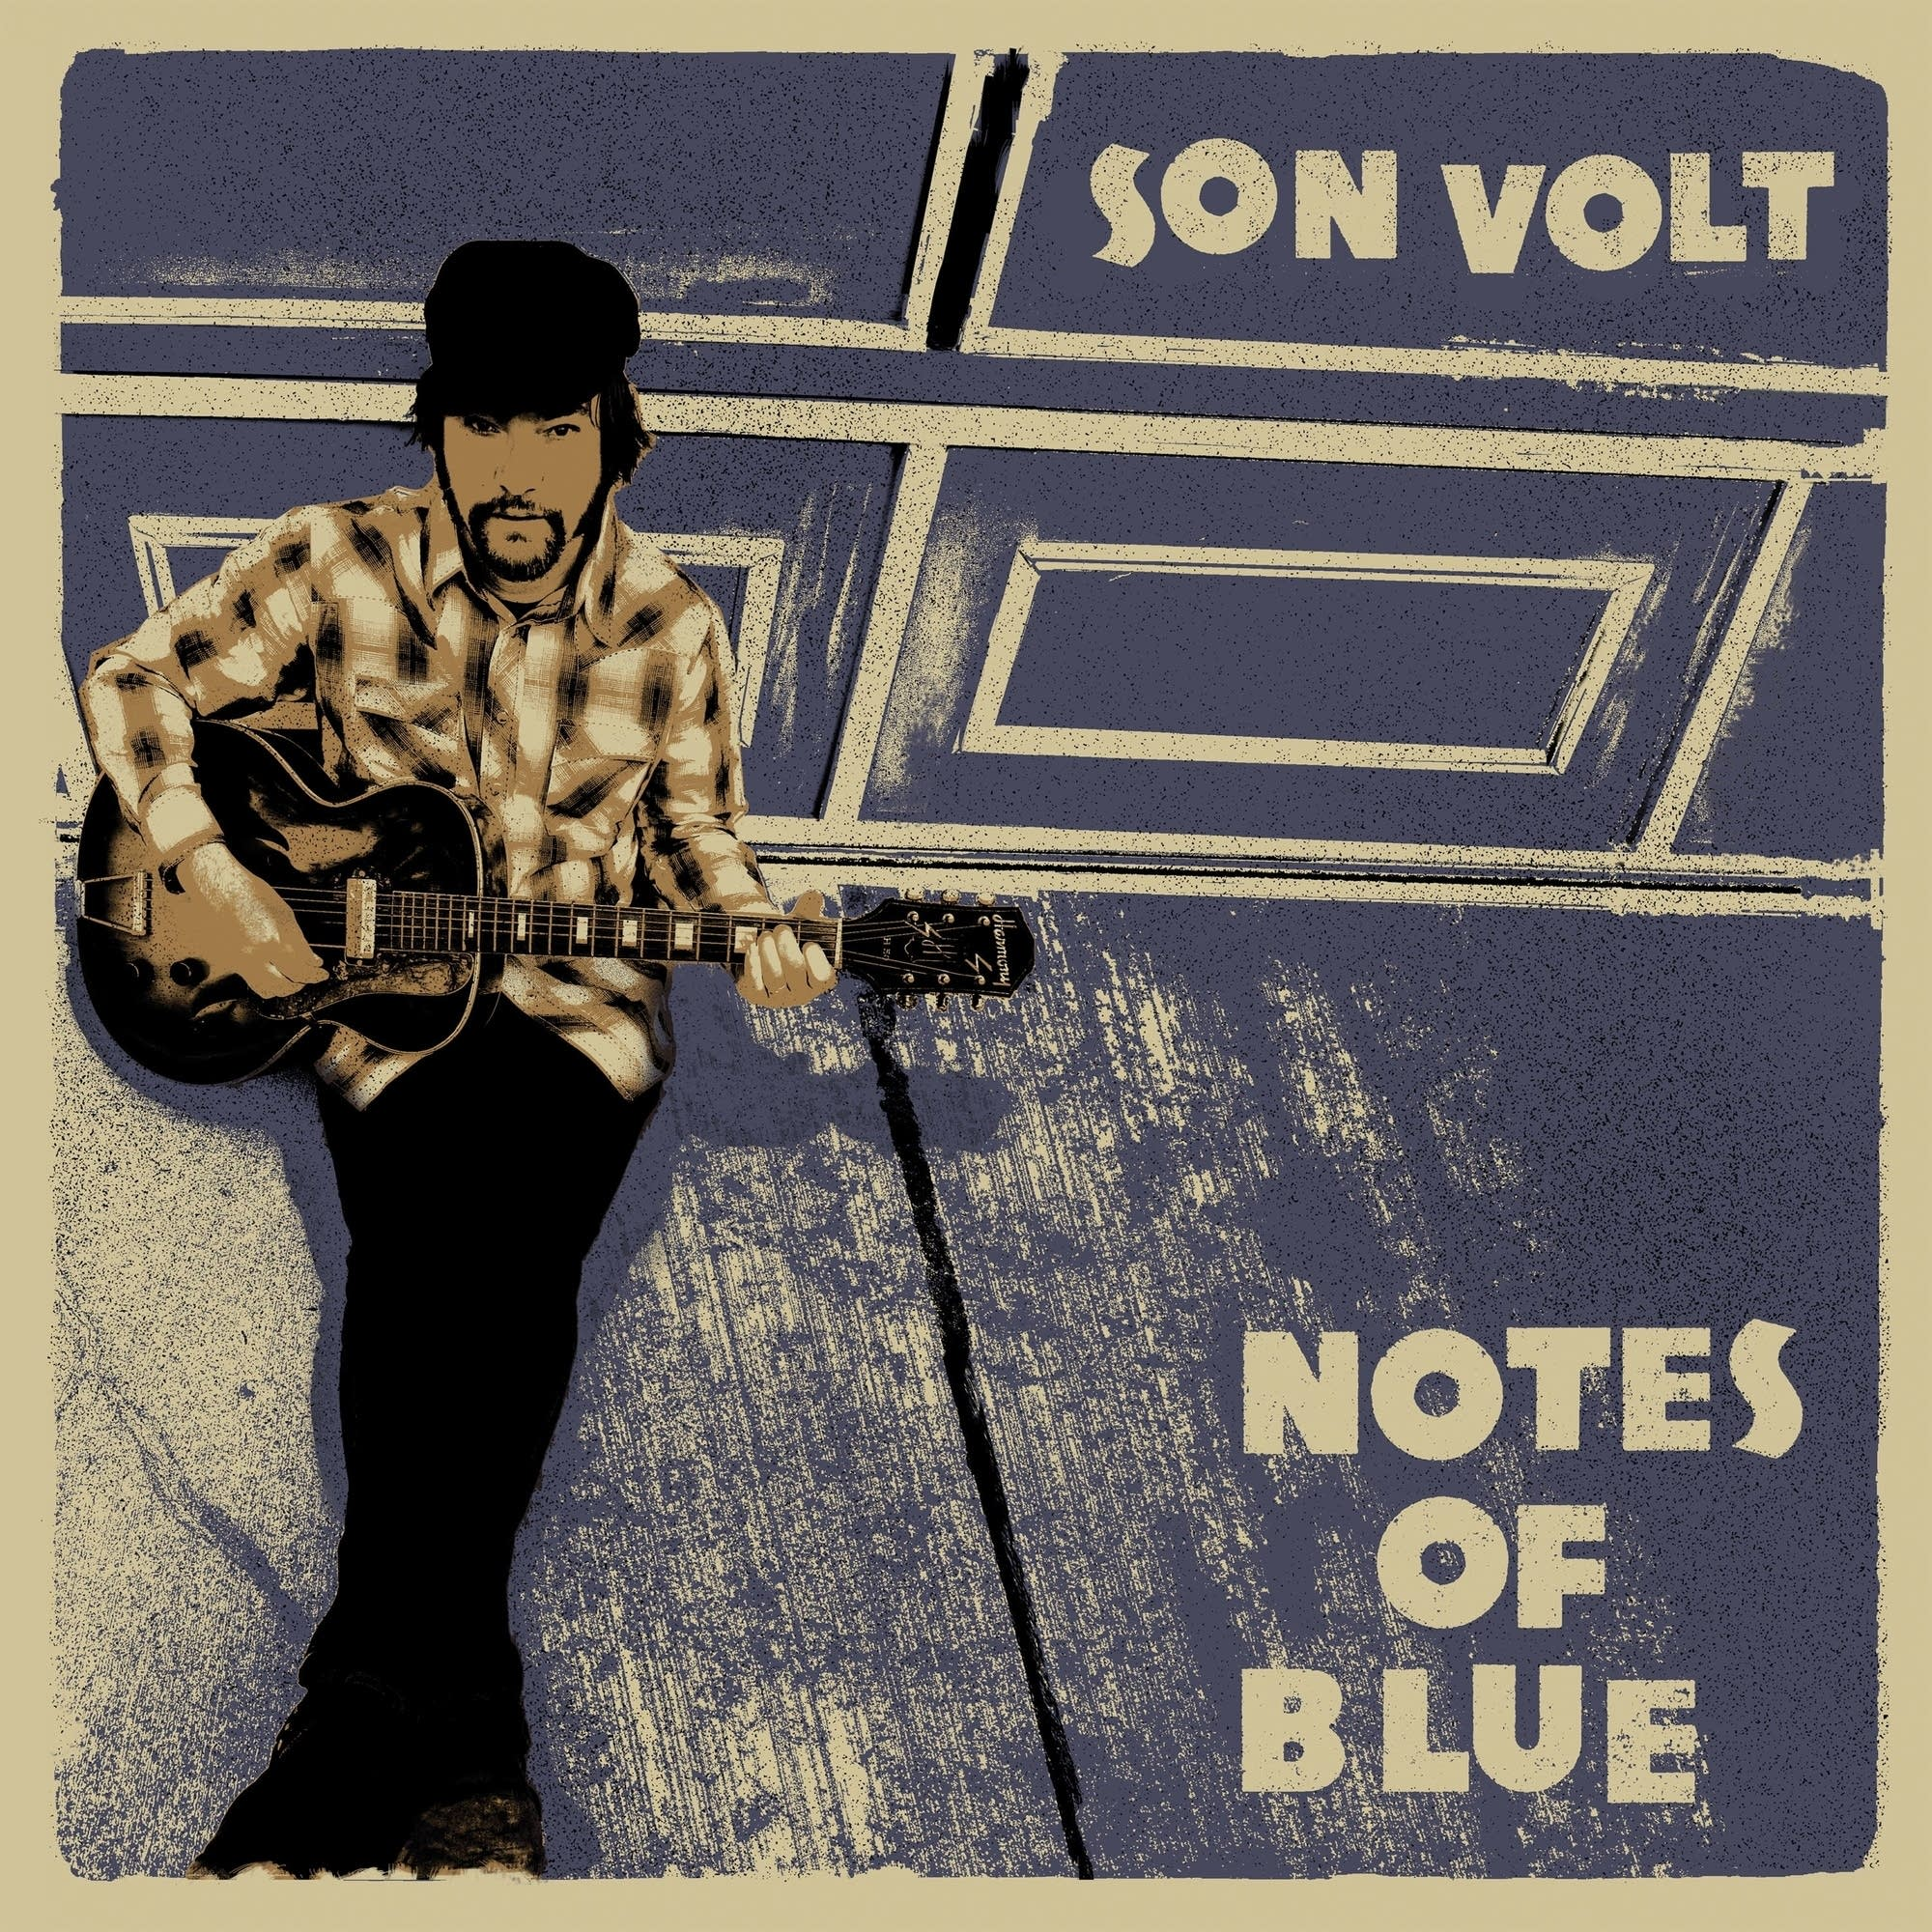 Son Volt, 'Notes of Blue'